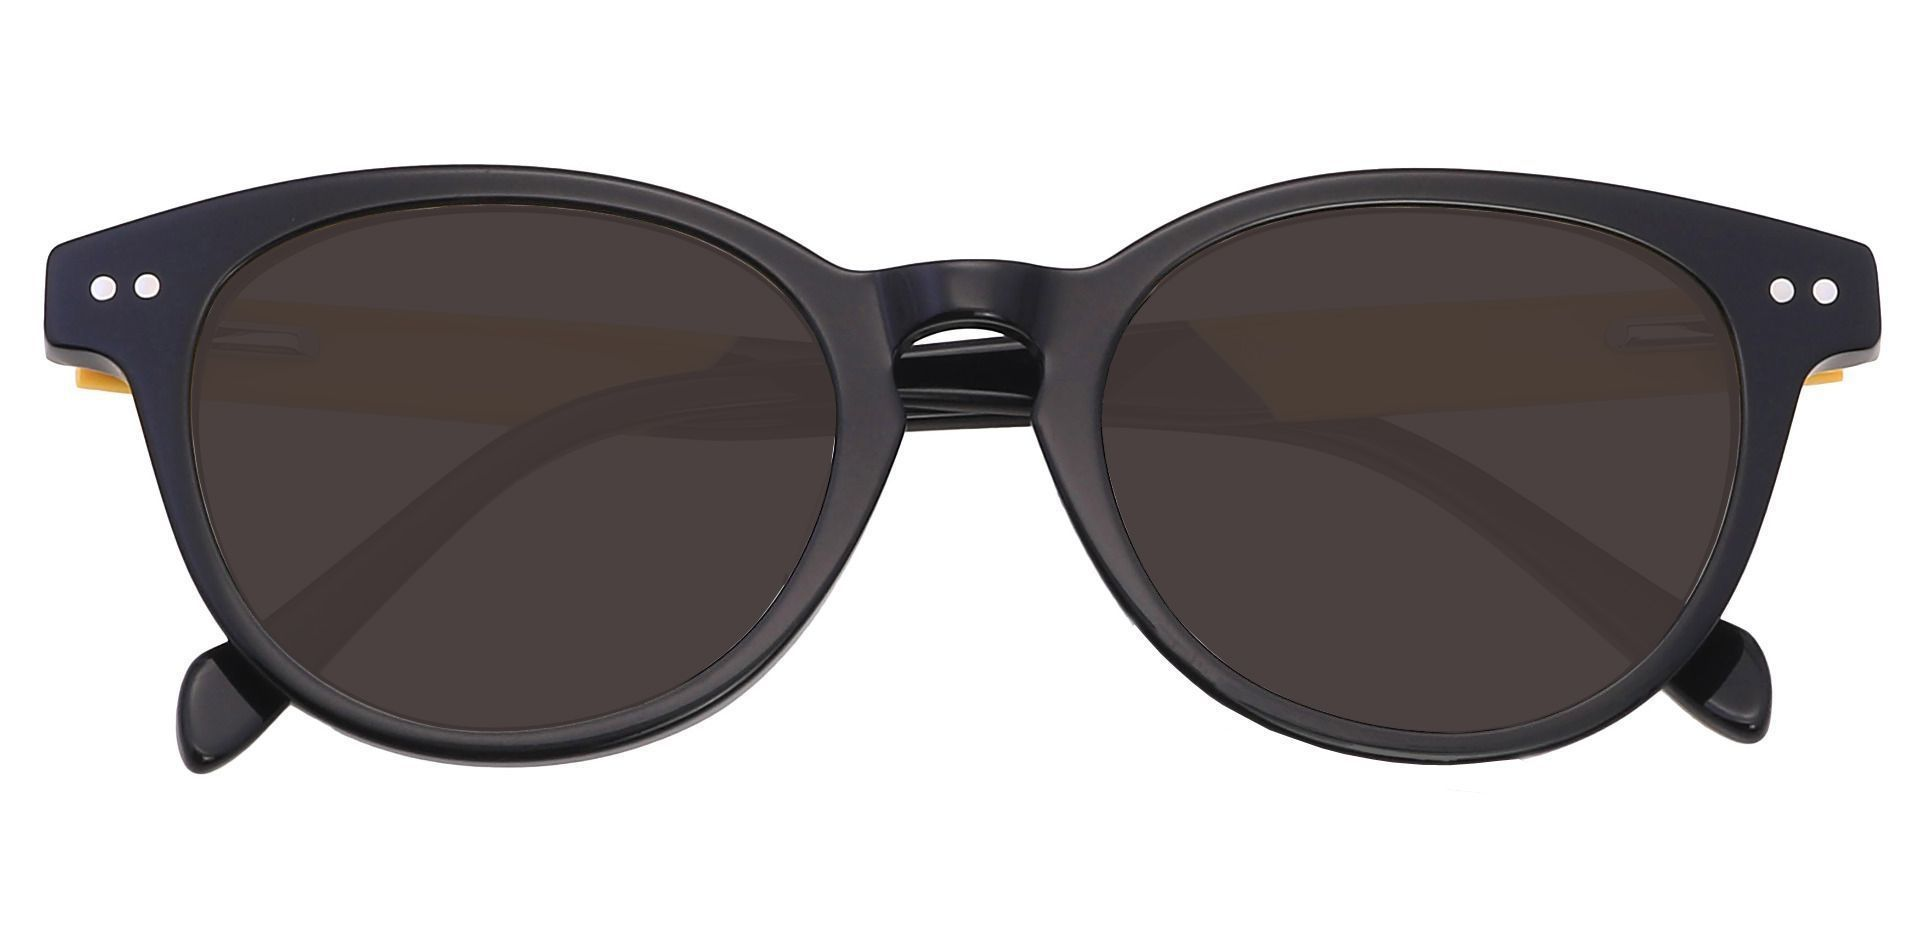 Oakland Oval Progressive Sunglasses - Black Frame With Gray Lenses